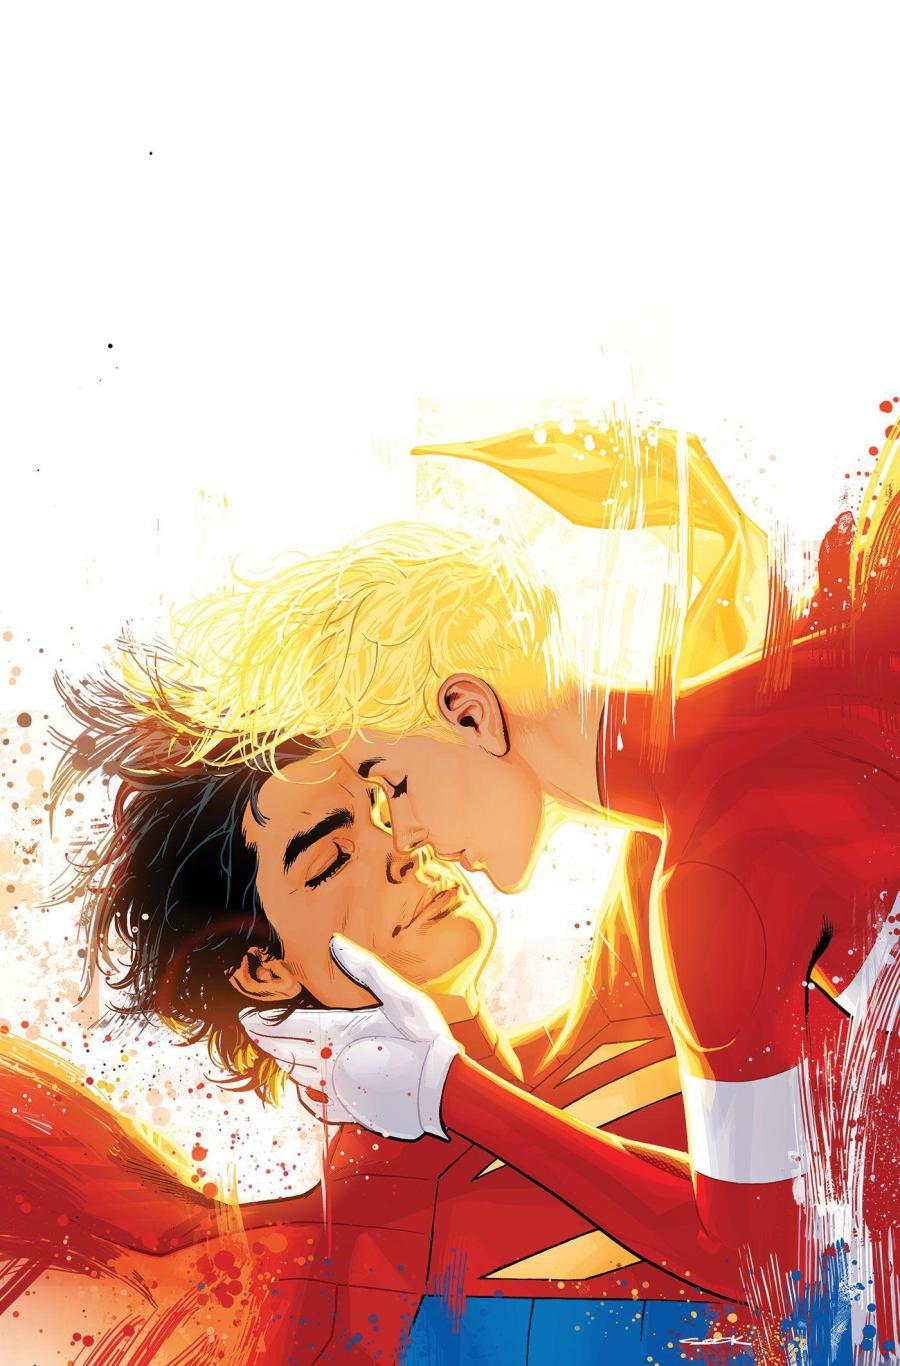 Cover] Legion of Super-Heroes #10 (by Ryan Sook) : DCcomics